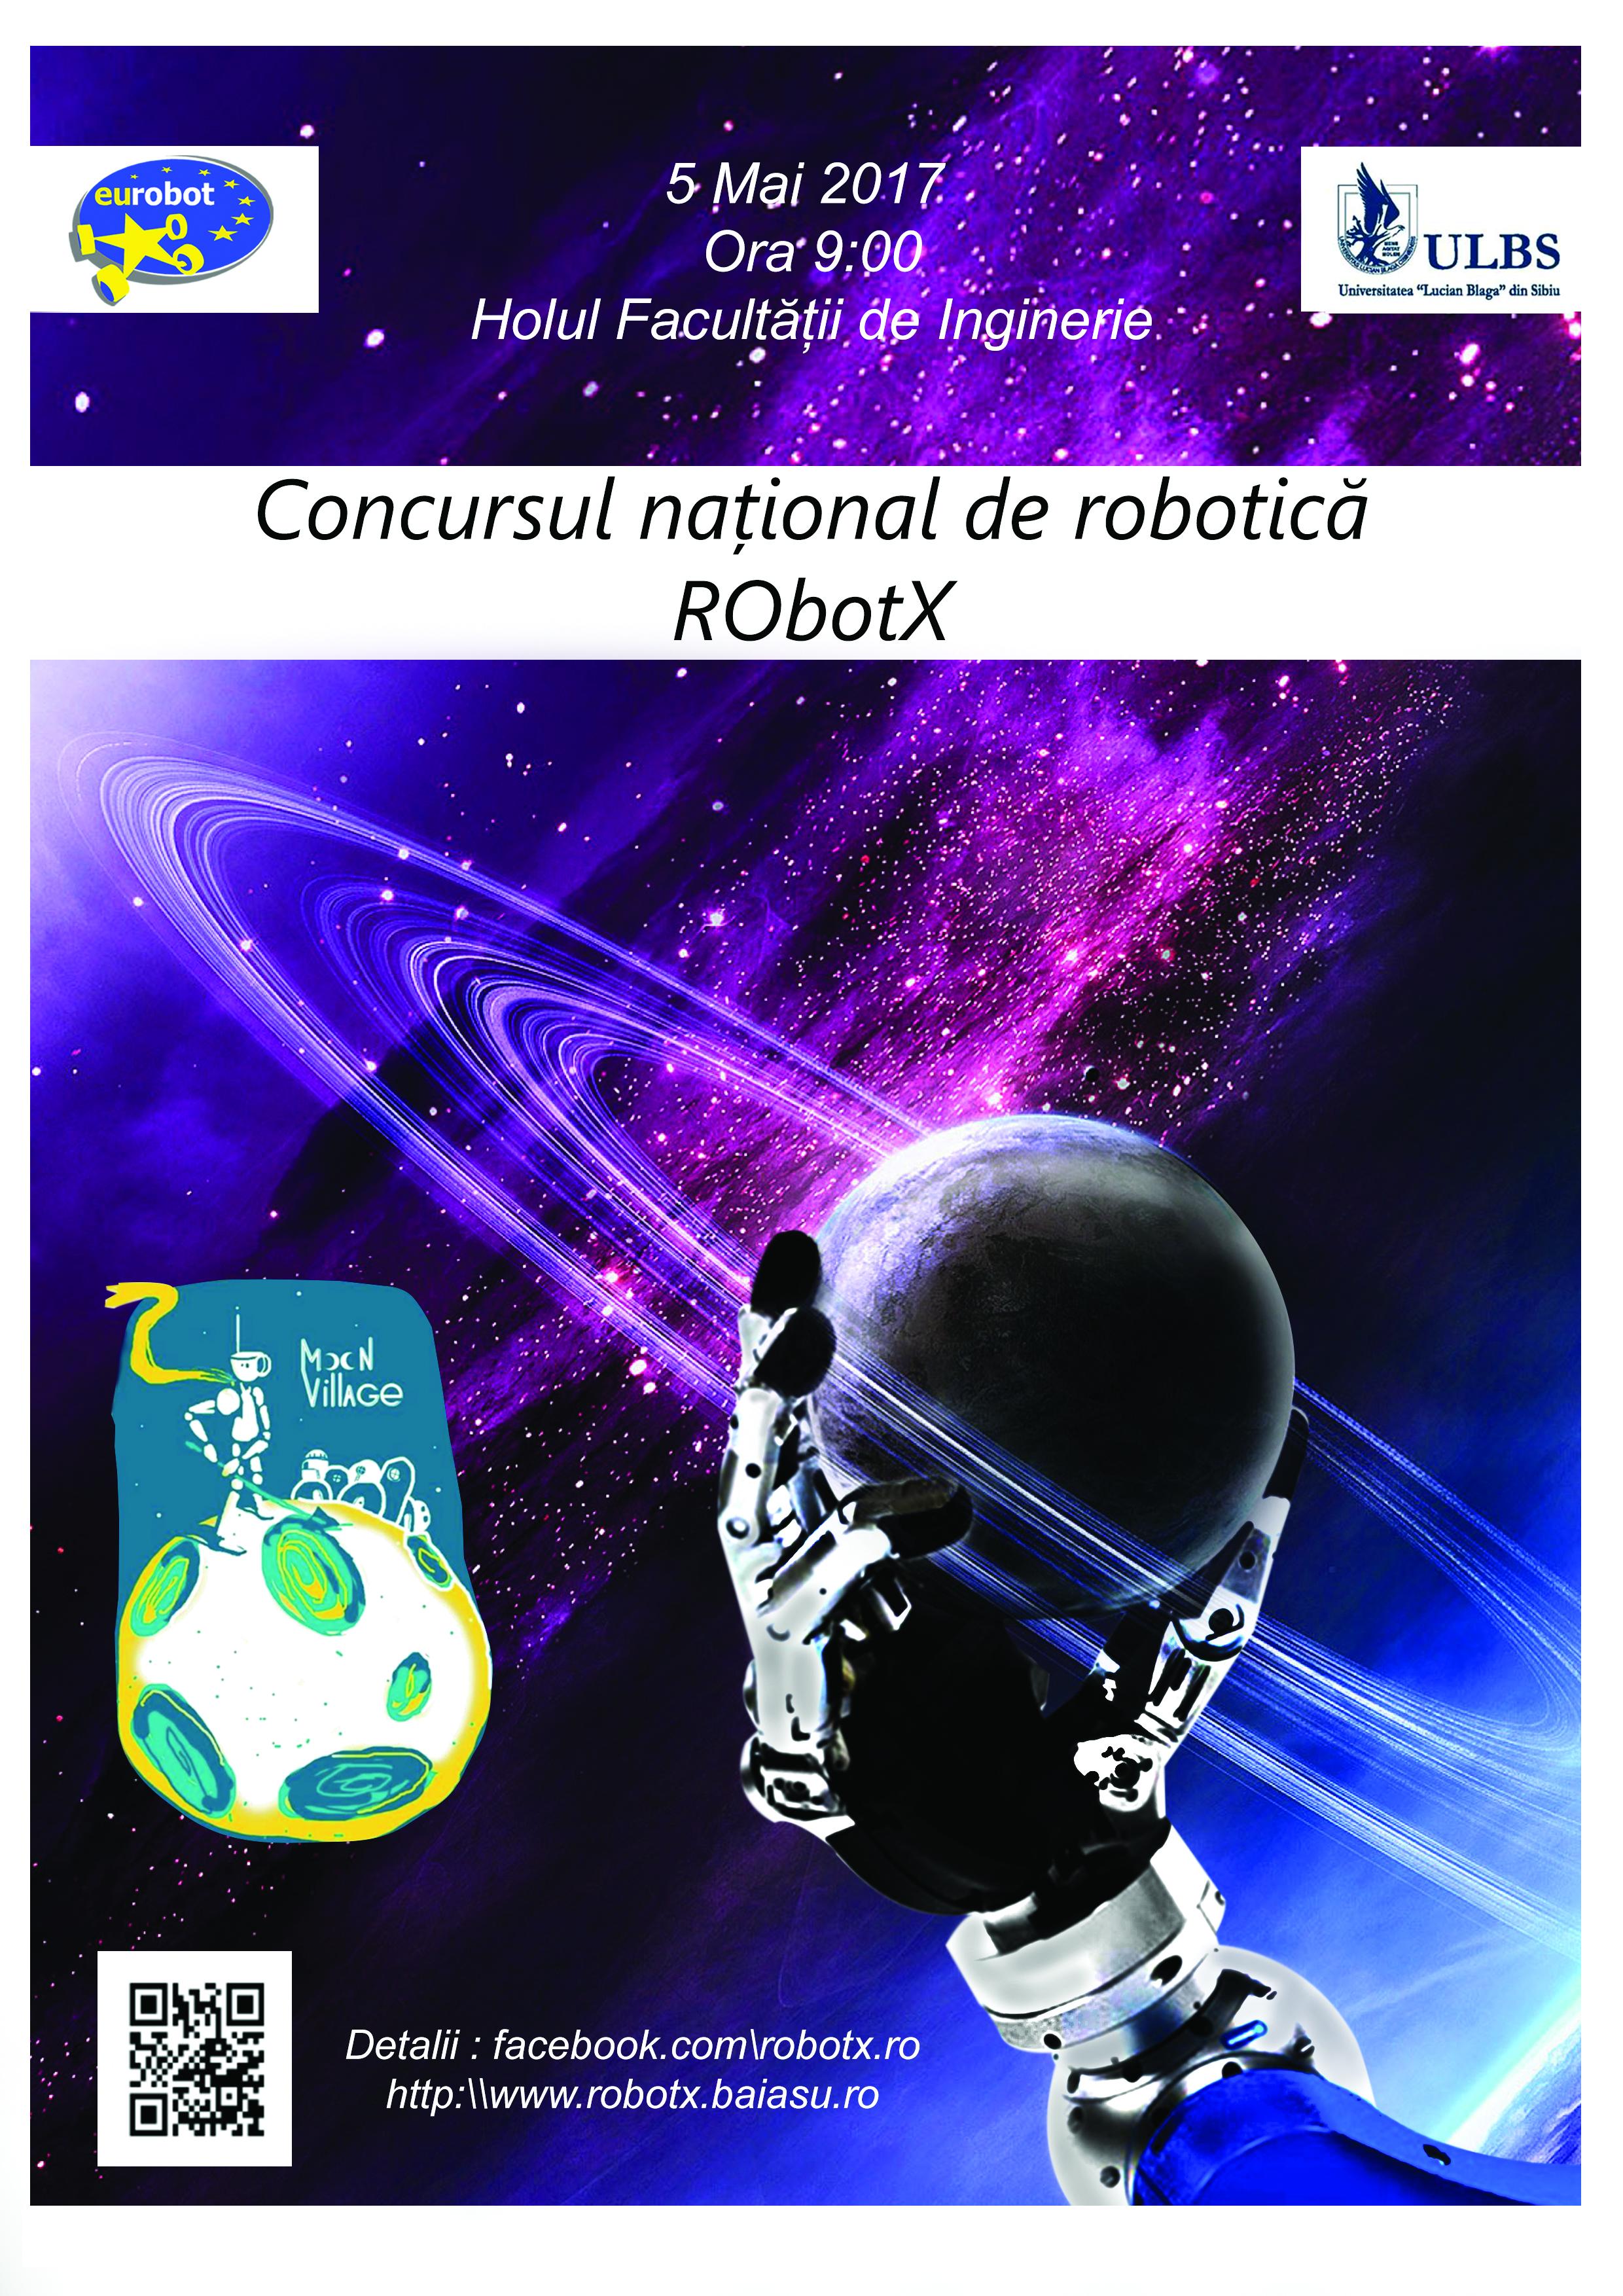 Concursul Național RObotX 2017